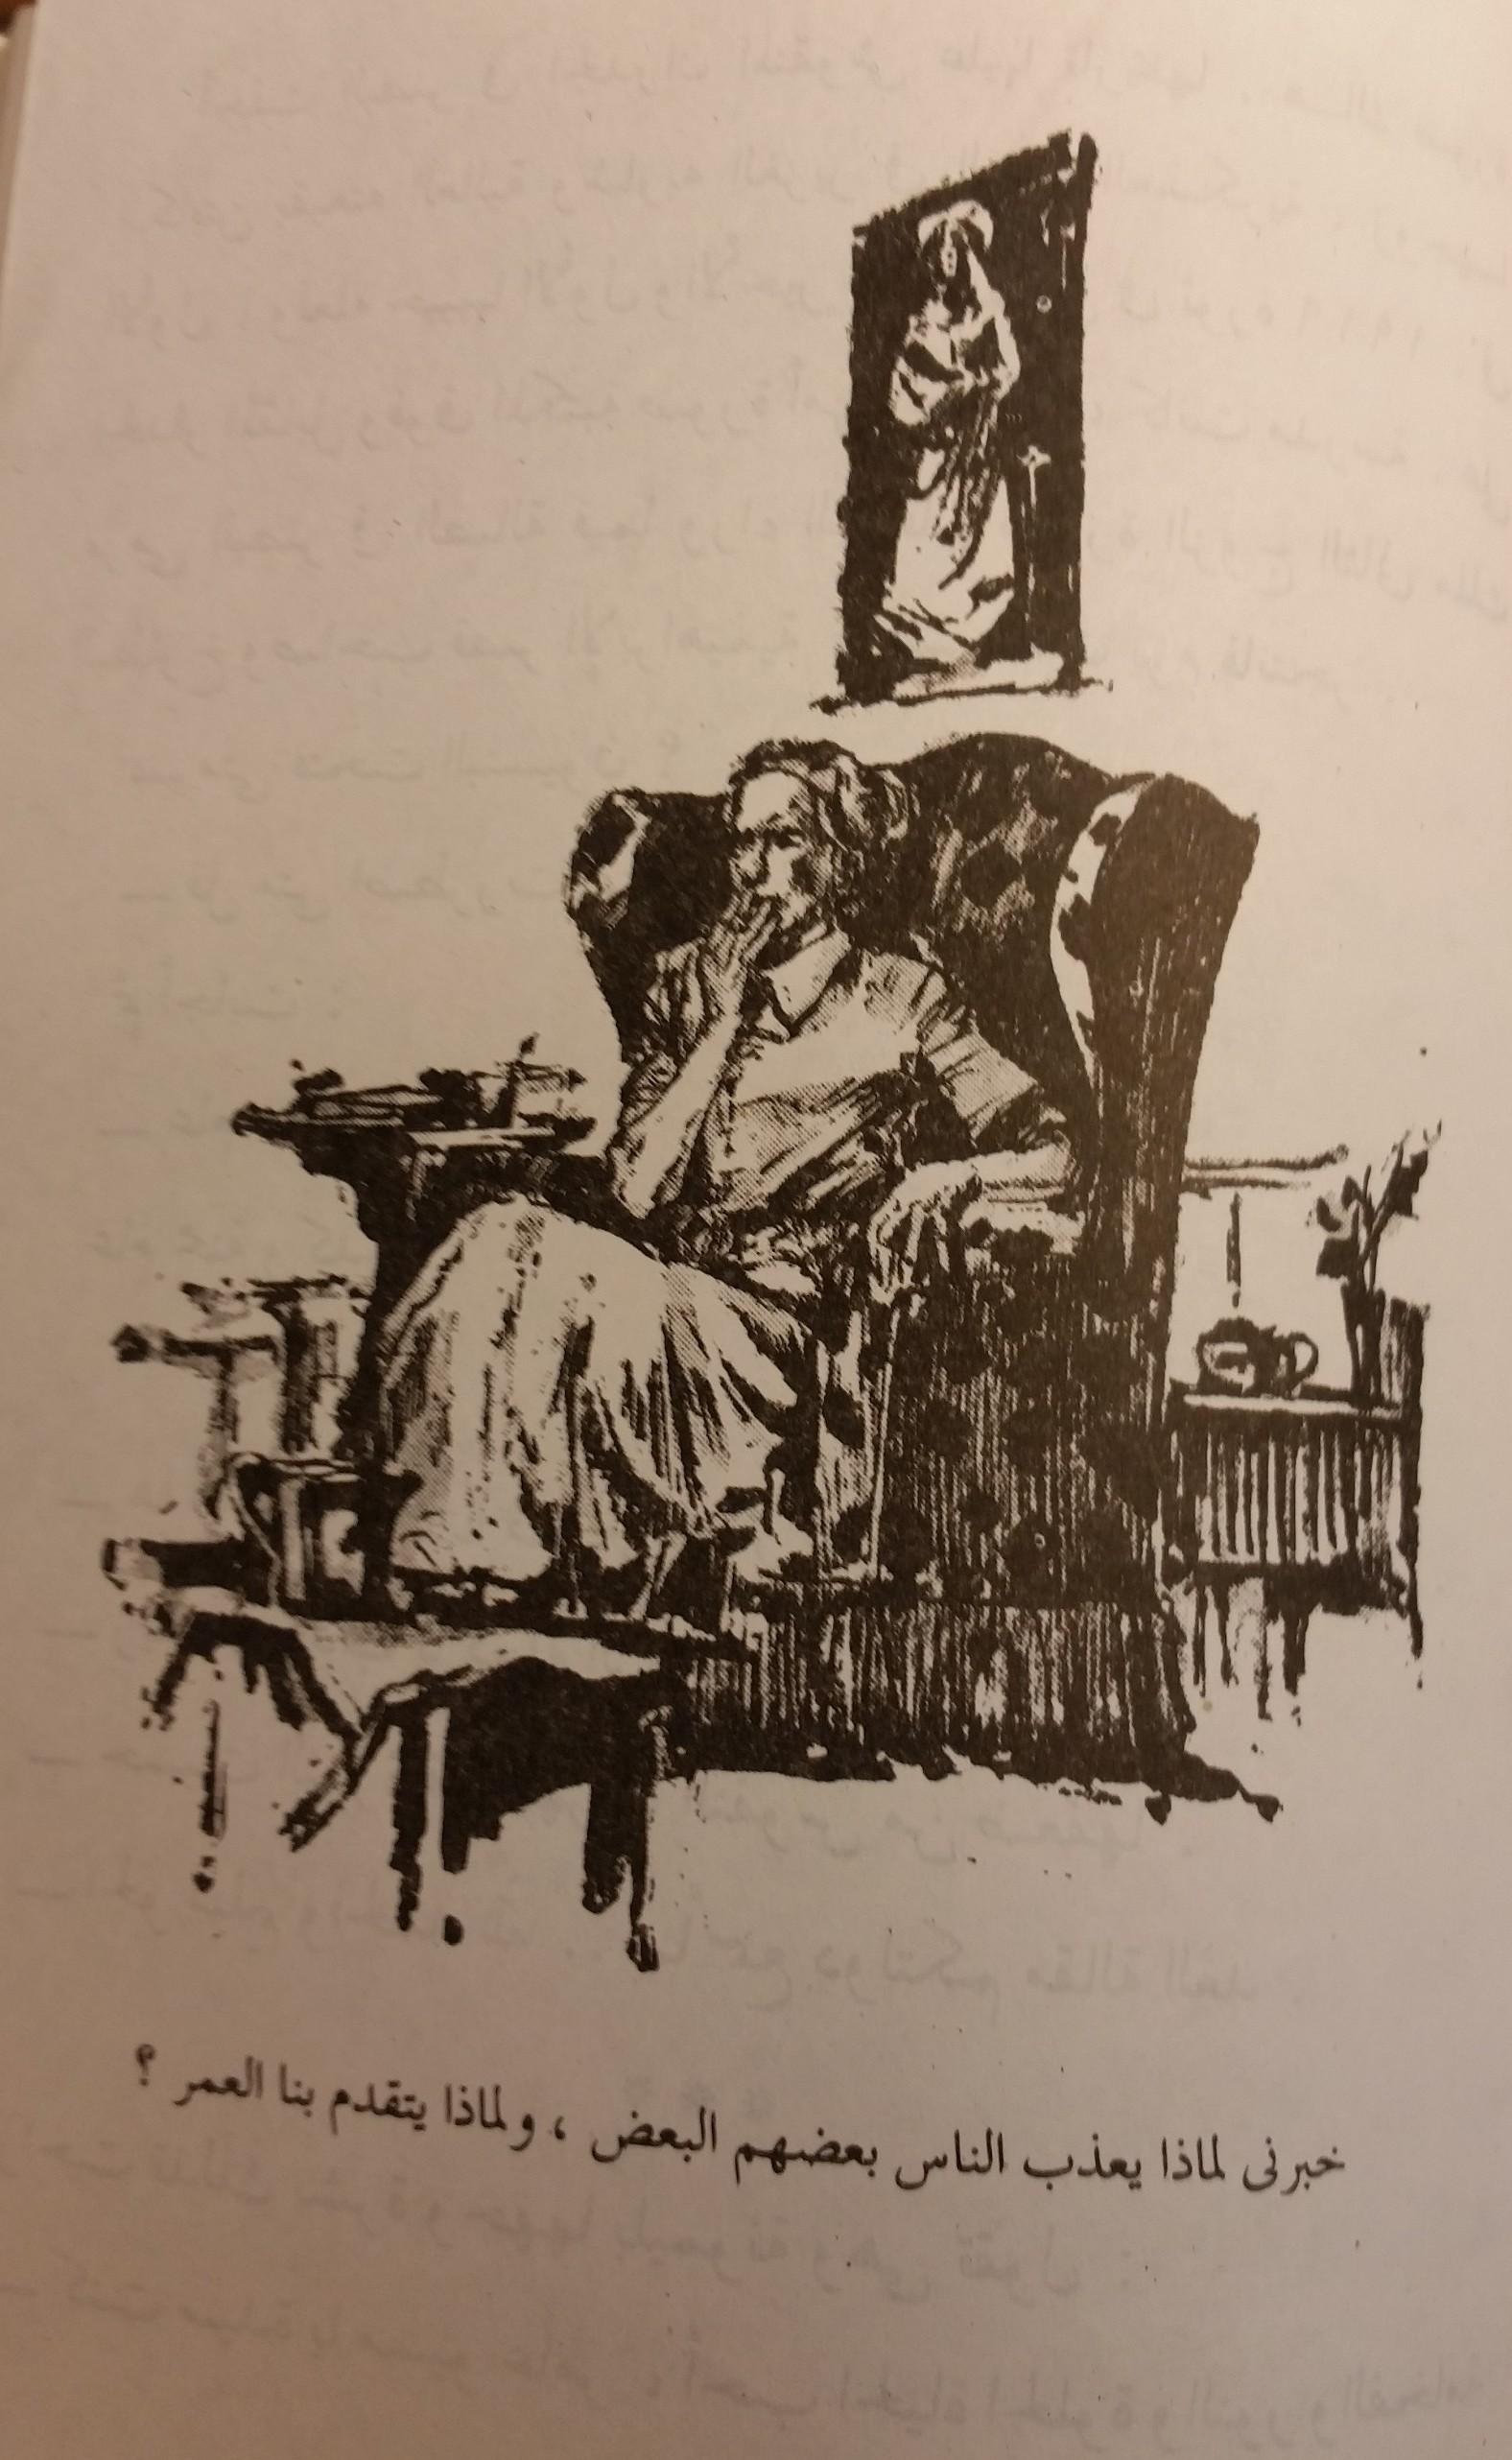 The last drawing from Mahfouz's Miramar.